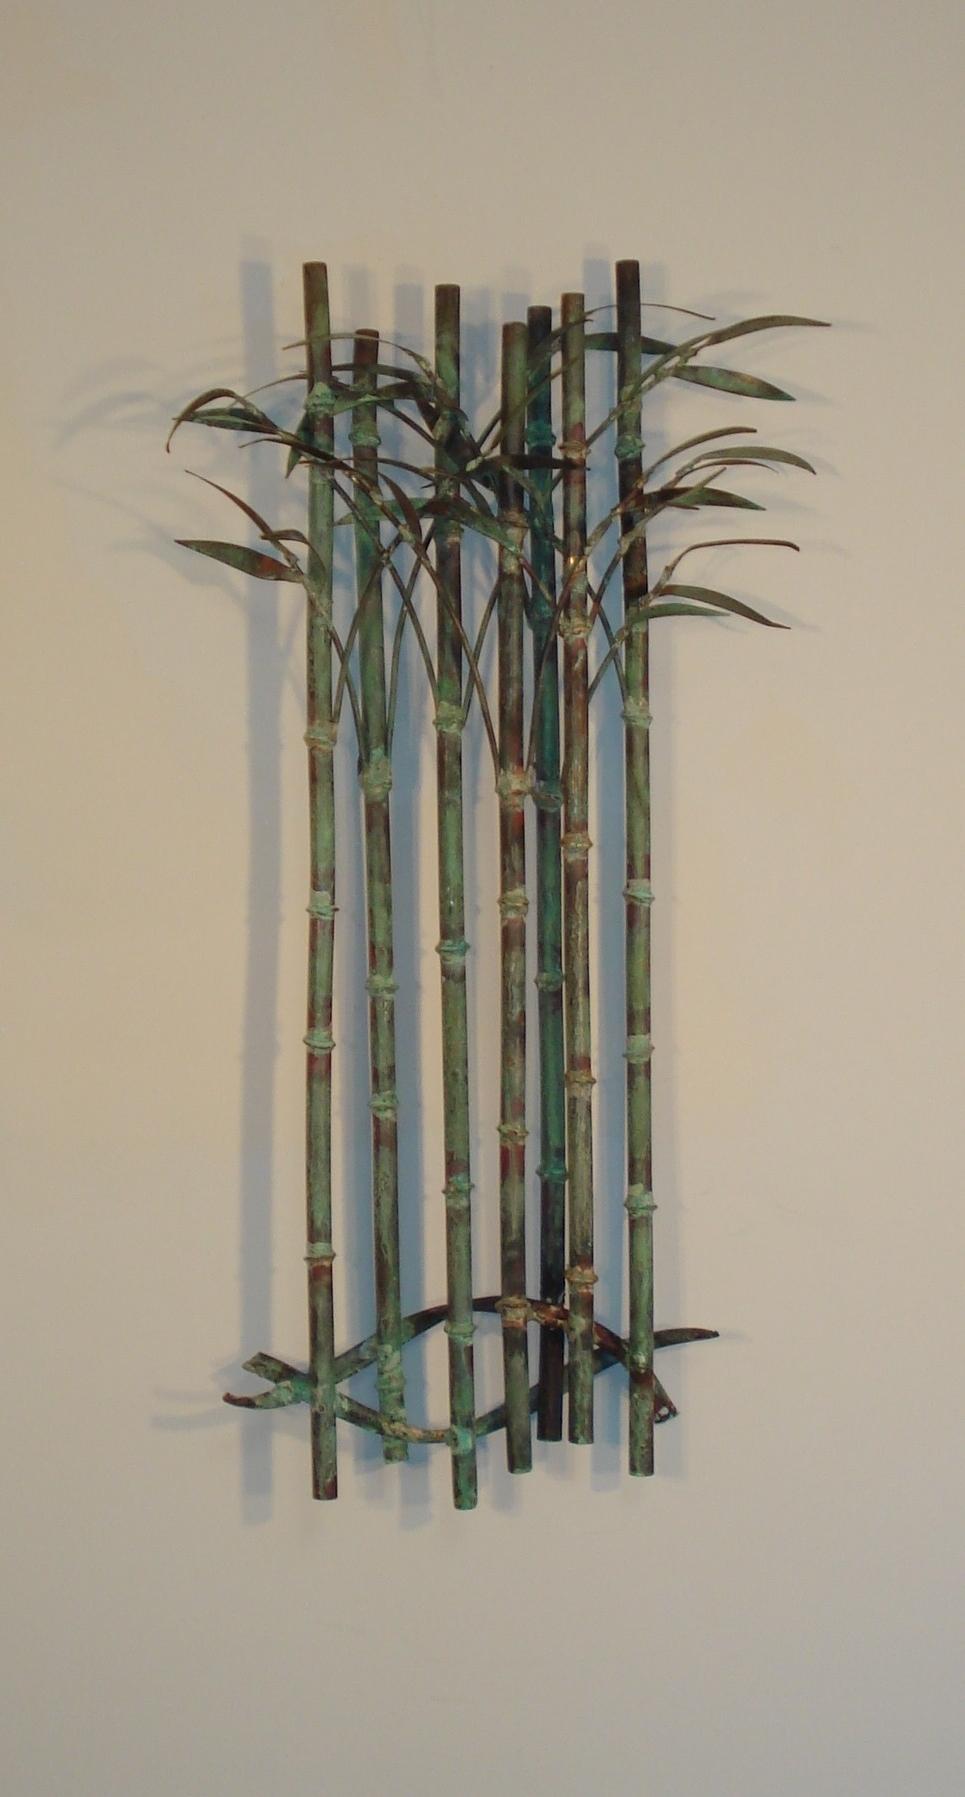 Bamboo Wall Art With Regard To Newest Bamboo Delight Metal Wall Art – Metal Wall Sculpture Decor – Gurtan (View 5 of 15)